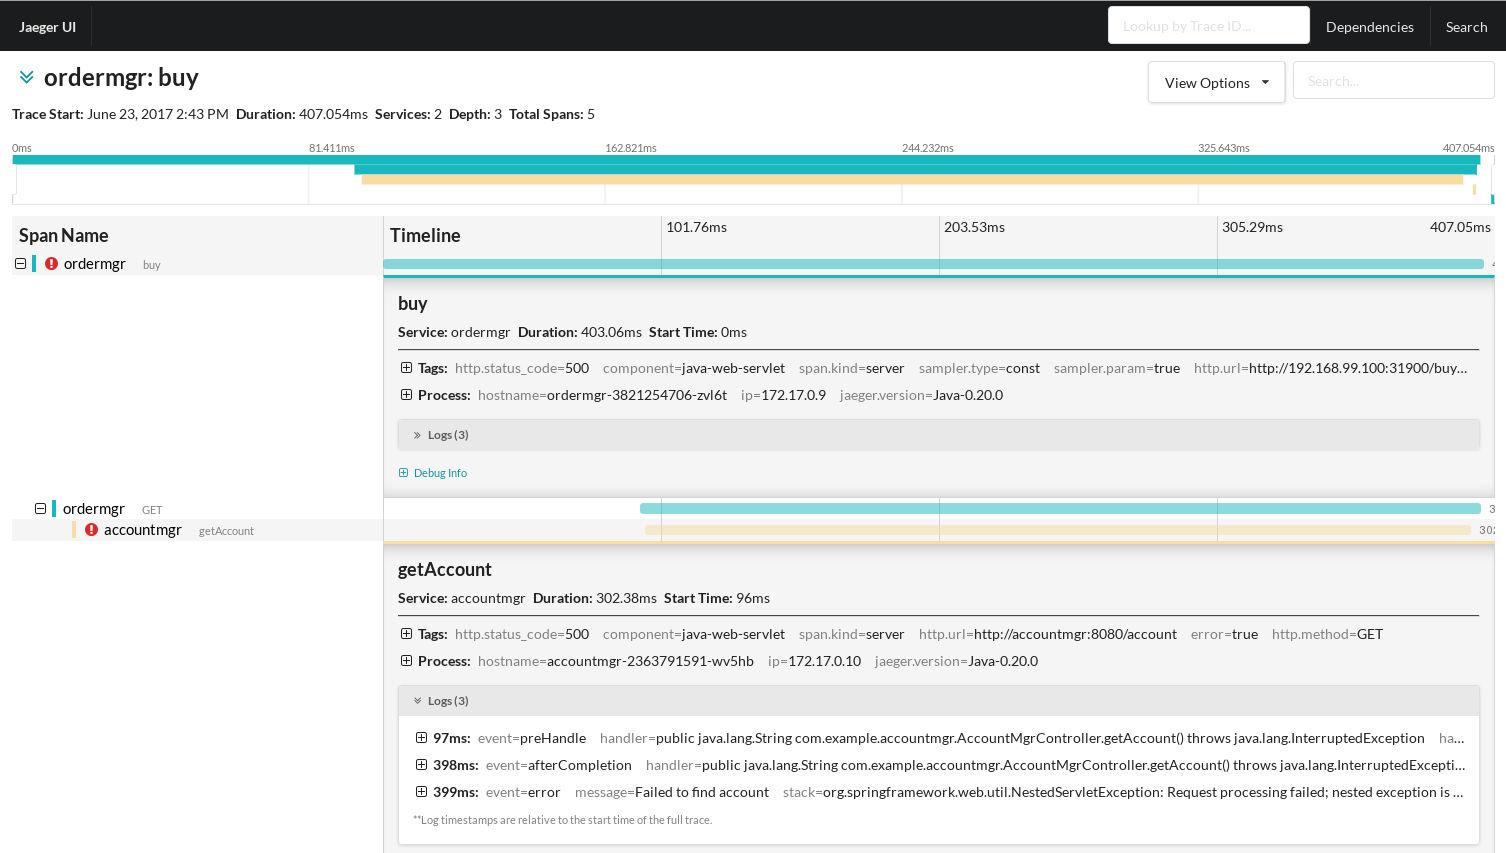 Hawkular - Using OpenTracing to collect Application Metrics